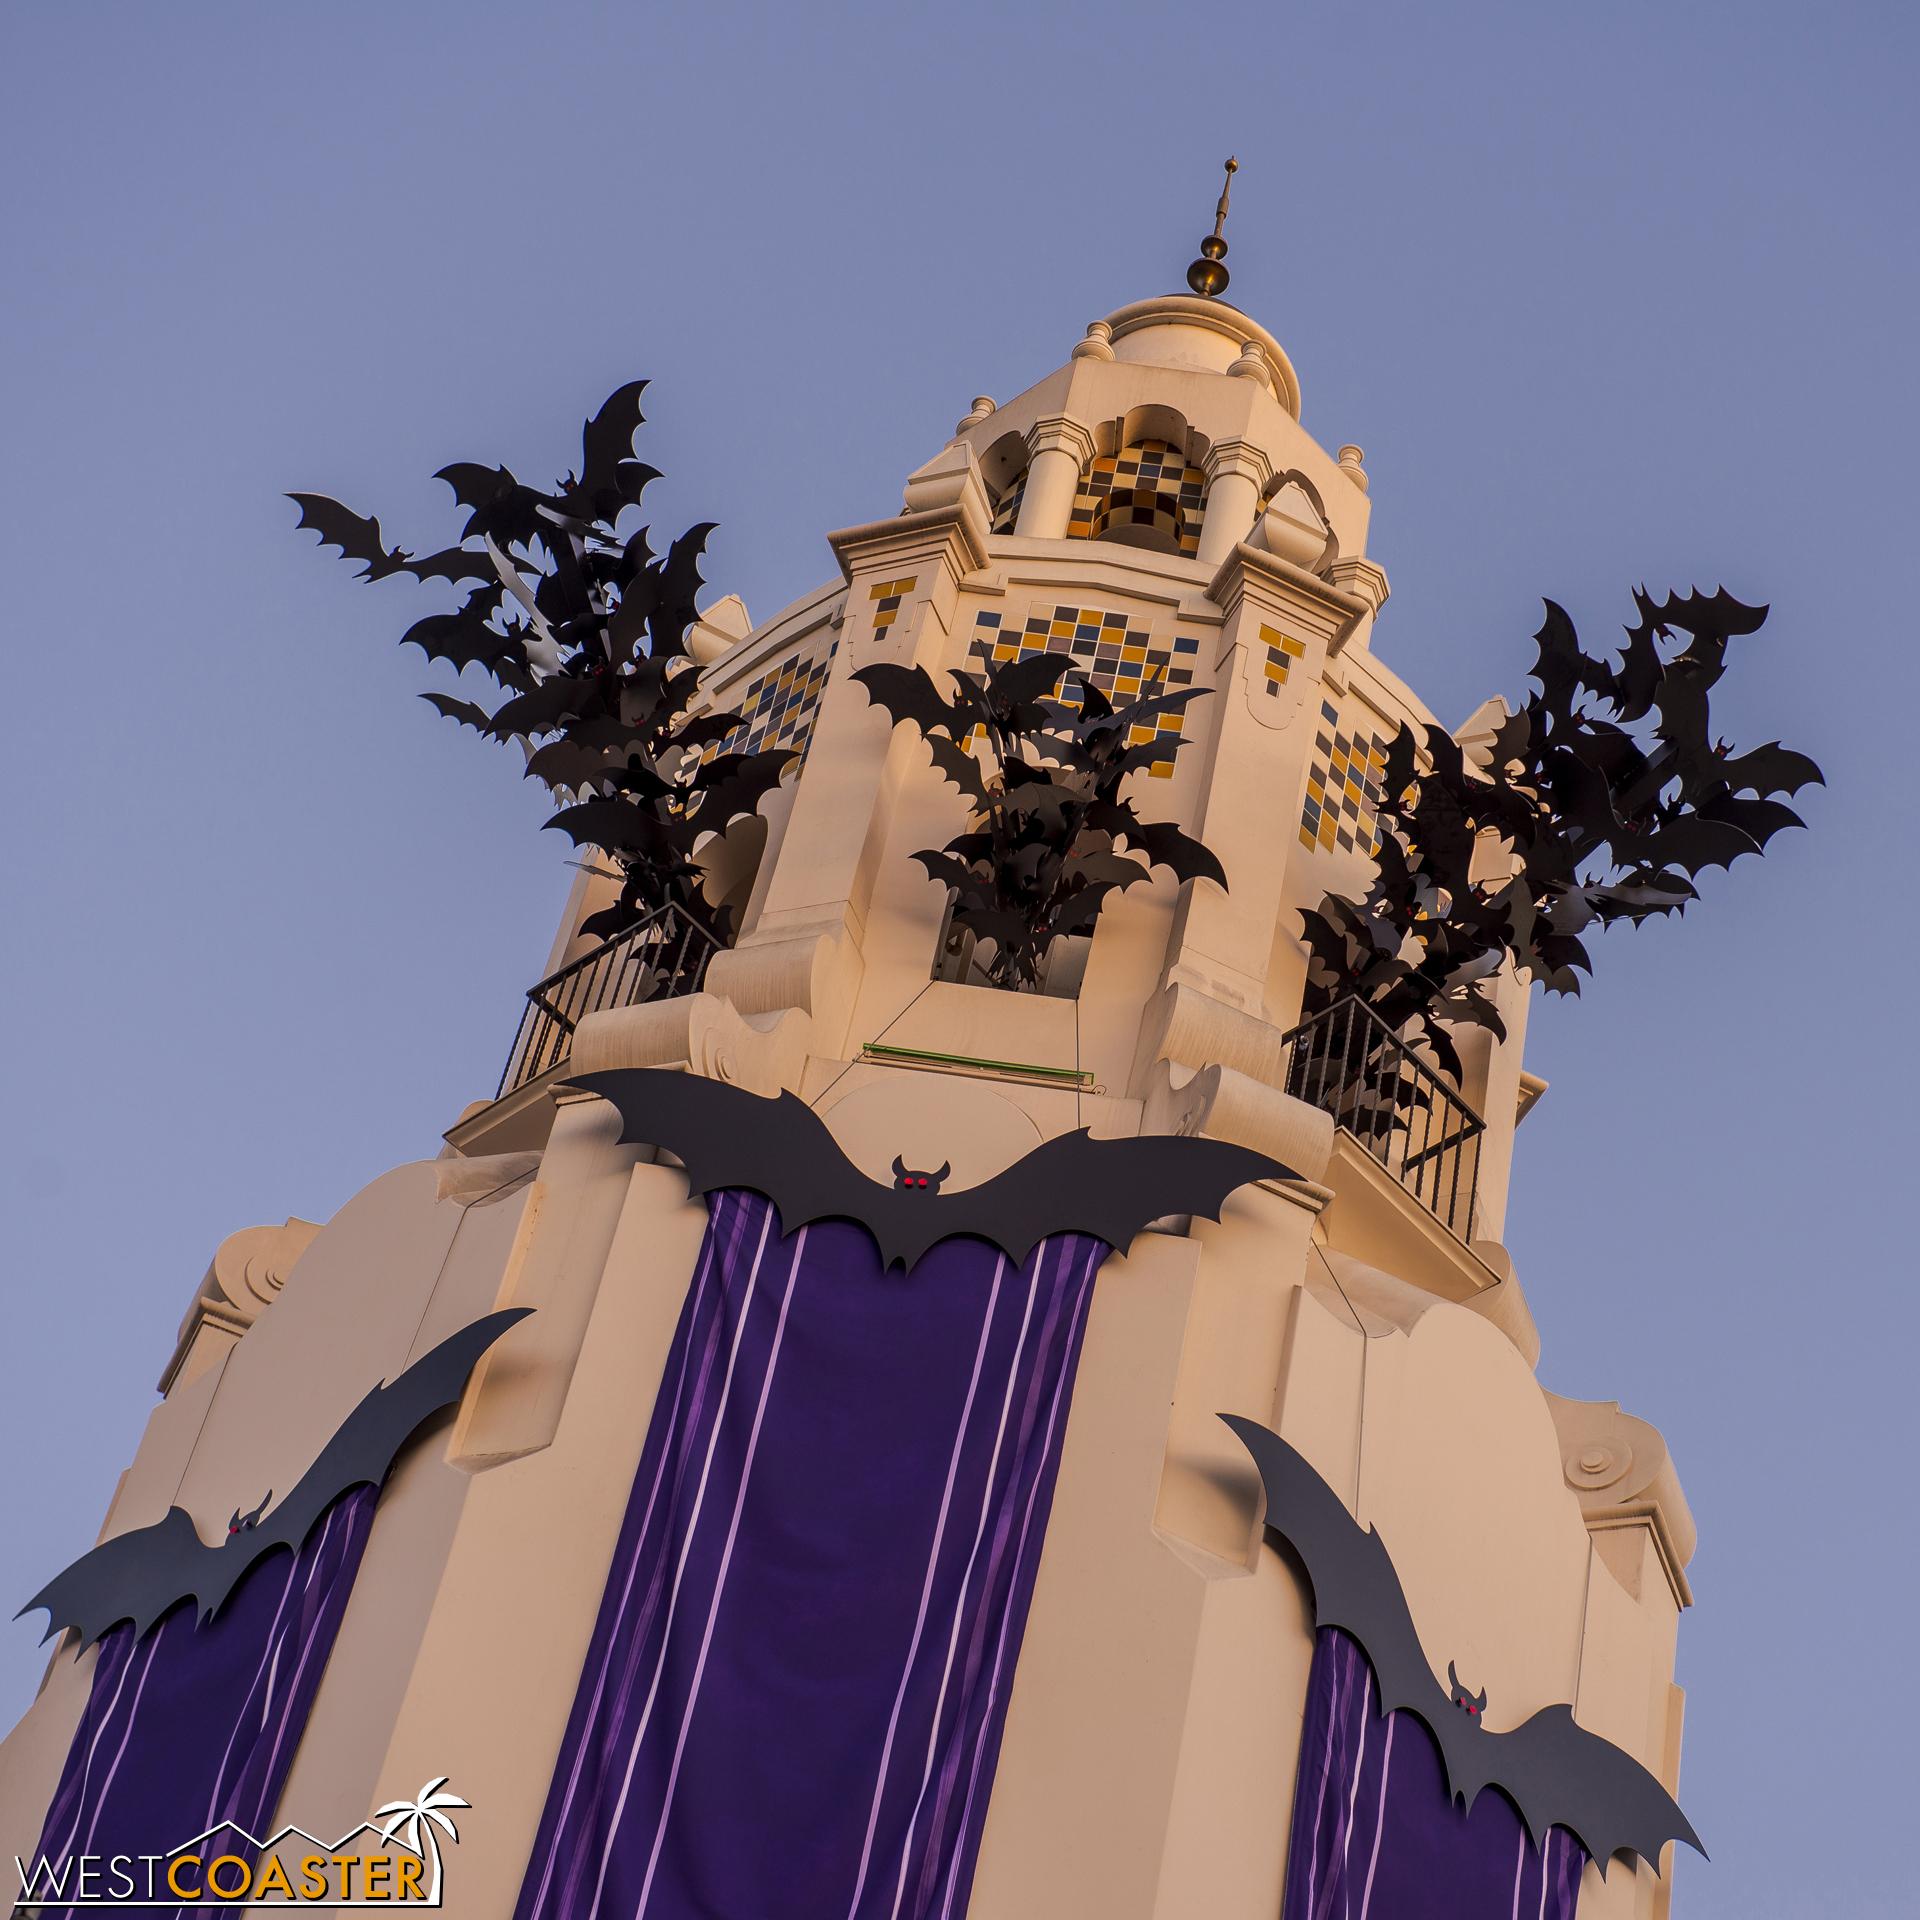 The Carthay Circle Restaurant tower had a dramatic exodus of bats.